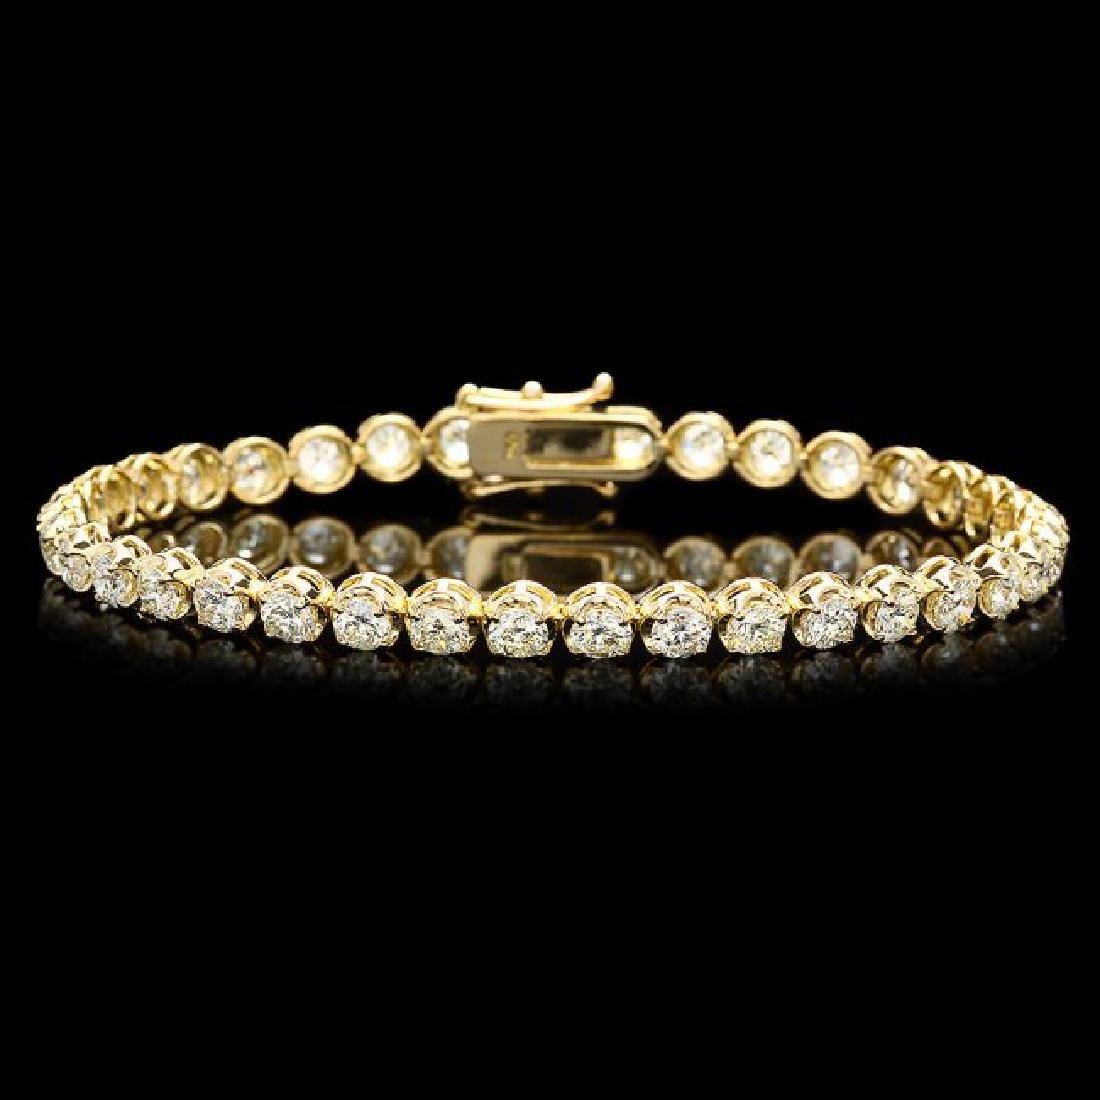 18k Yellow Gold 7.60ct Diamond Bracelet